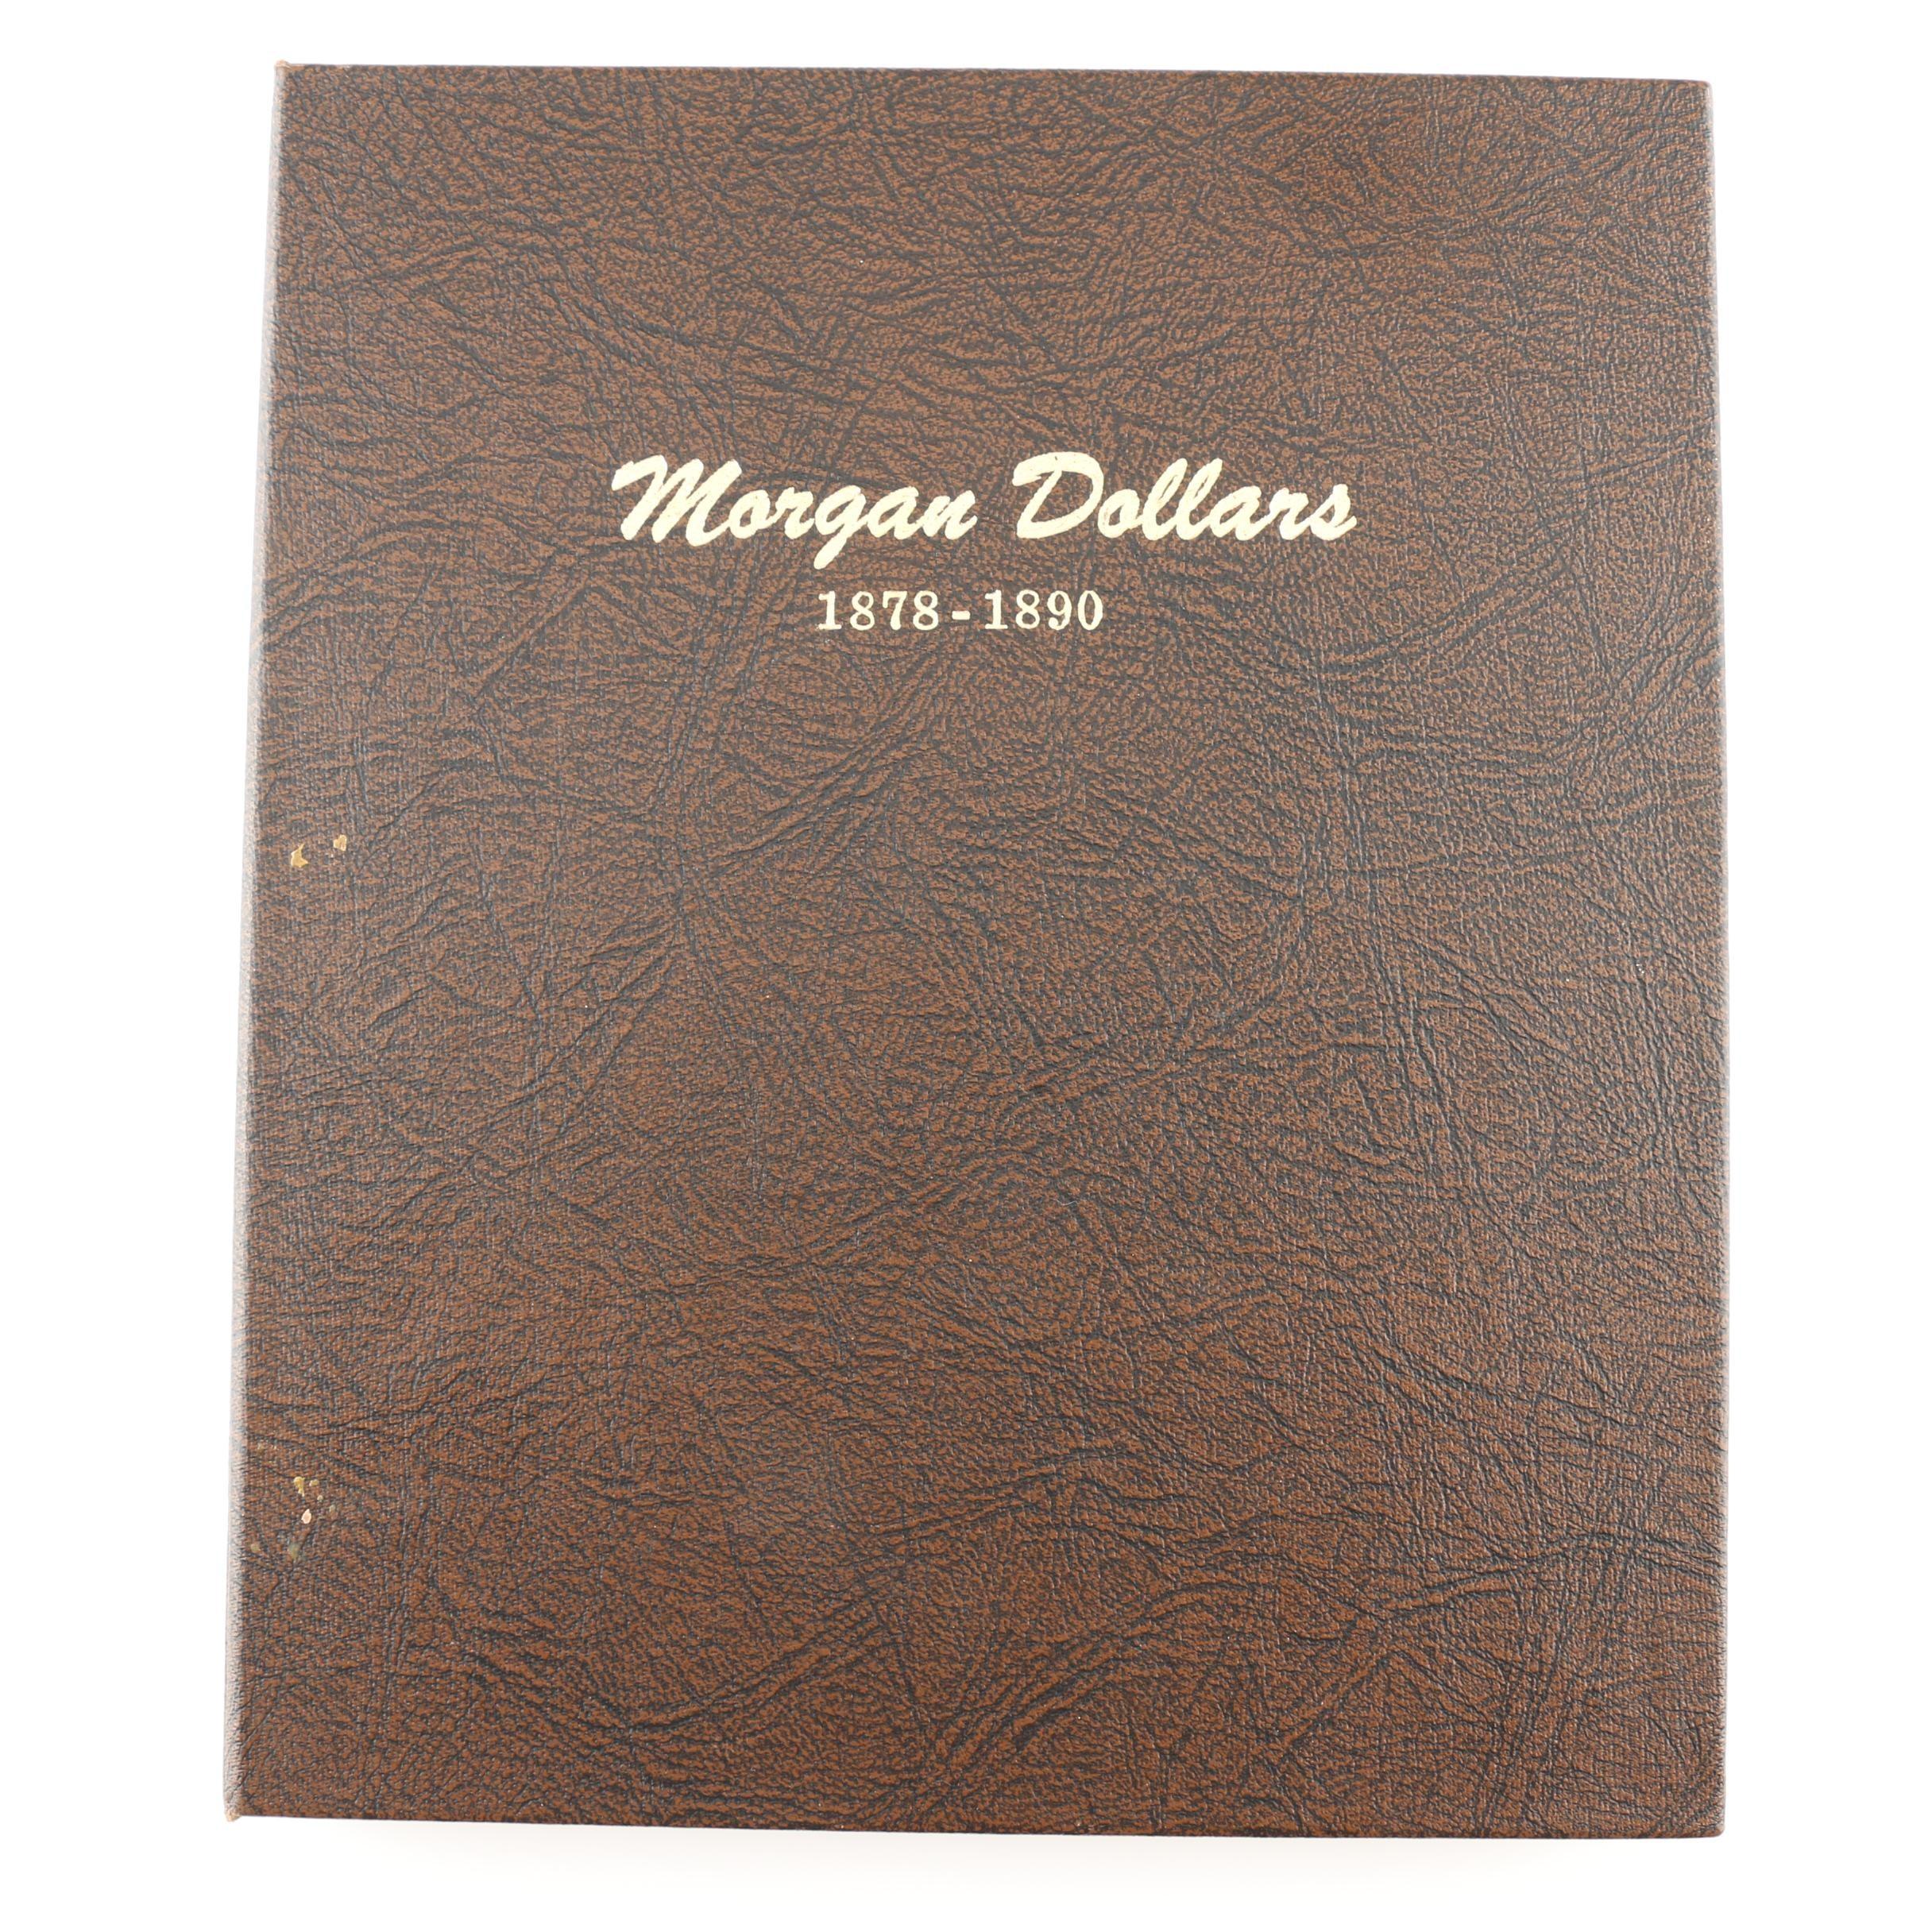 Complete Dansco Album of Morgan Silver Dollars 1878-1890, Including 1889-CC